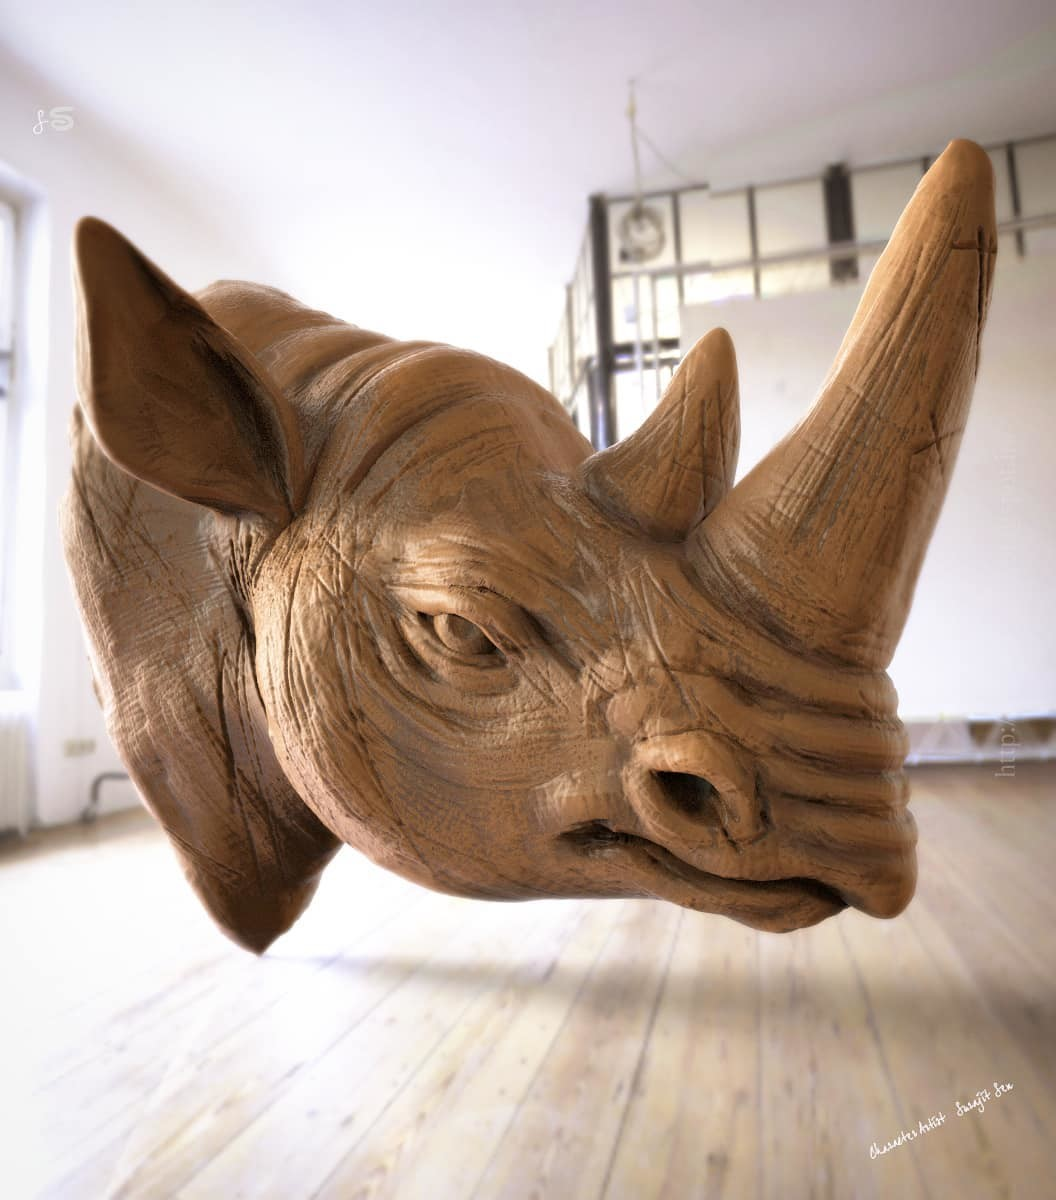 Surajit sen rhino quick sculpt surajitsen i